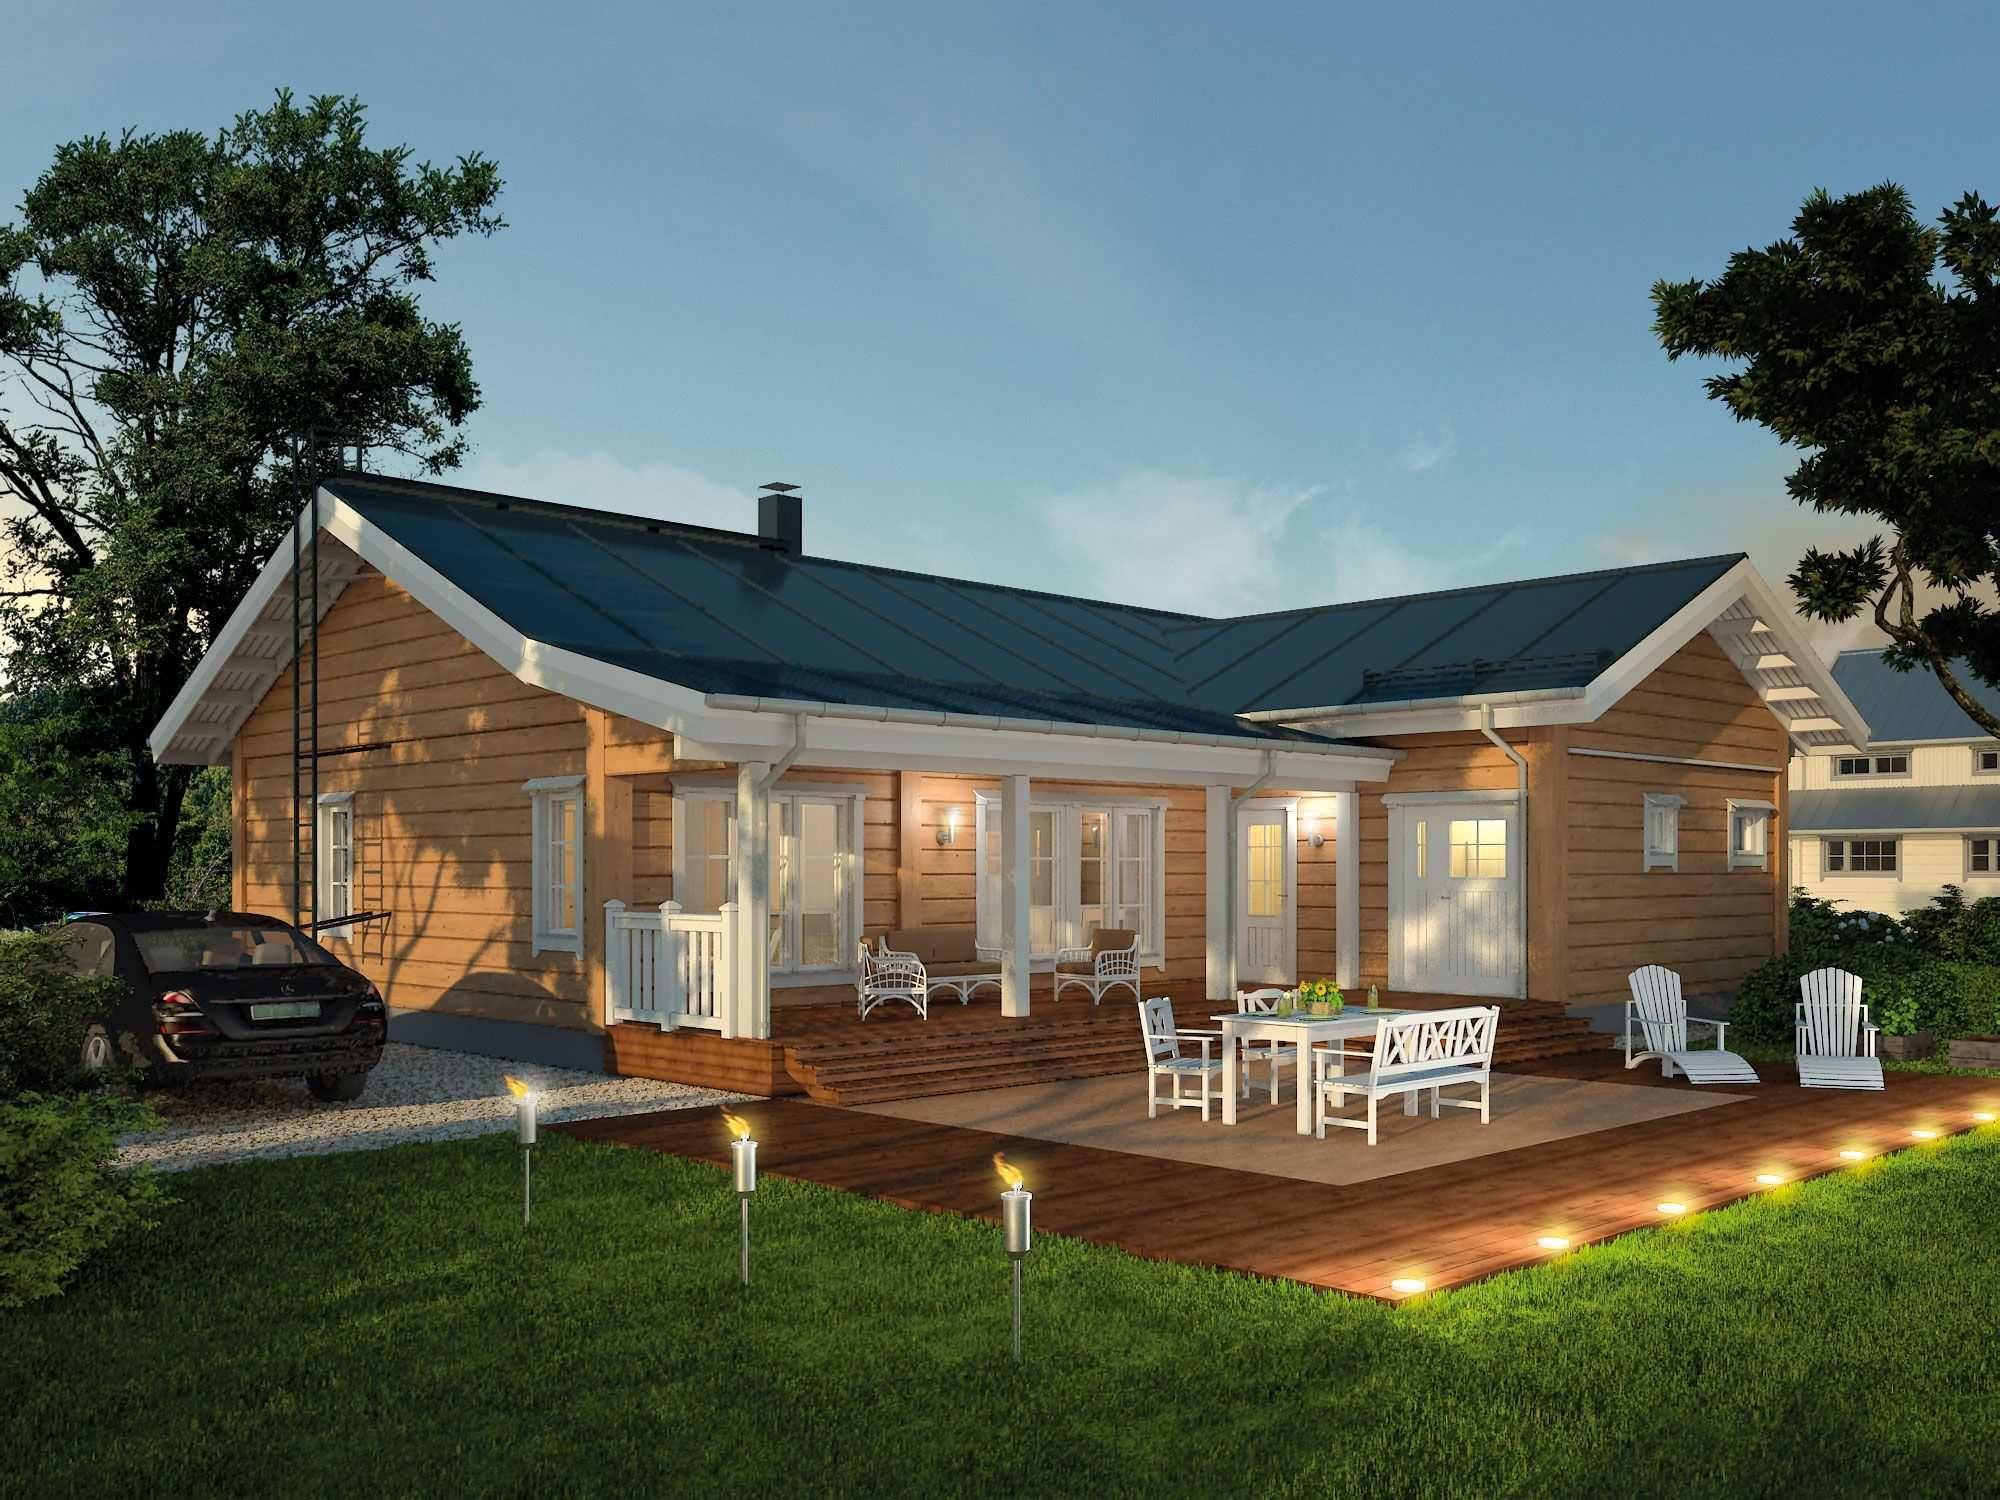 Small Modular Farmhouse Luxury Style Homes Unique Architectural Styles American